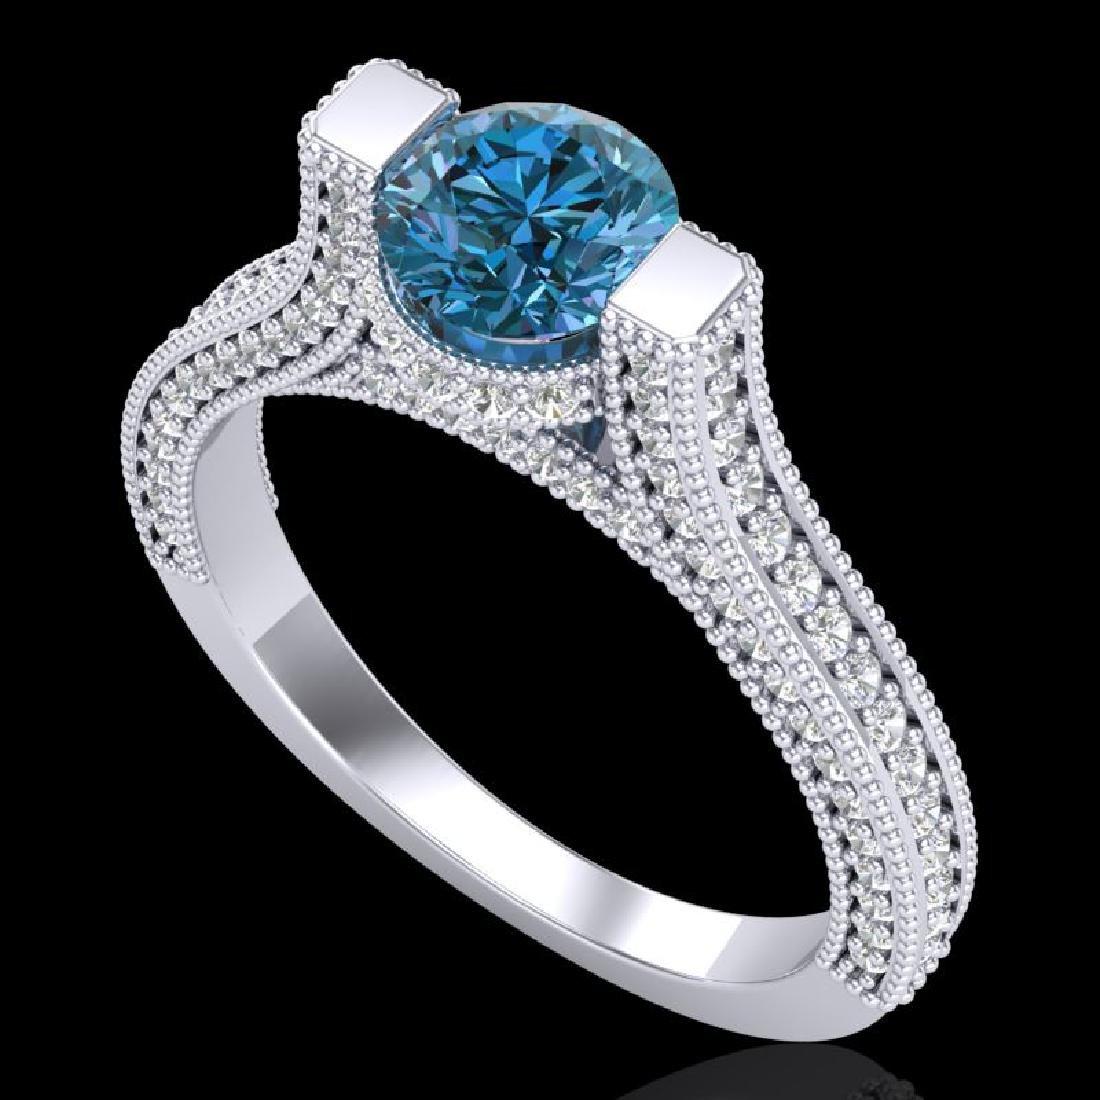 2 CTW Fancy Intense Blue Diamond Engagement Micro Pave